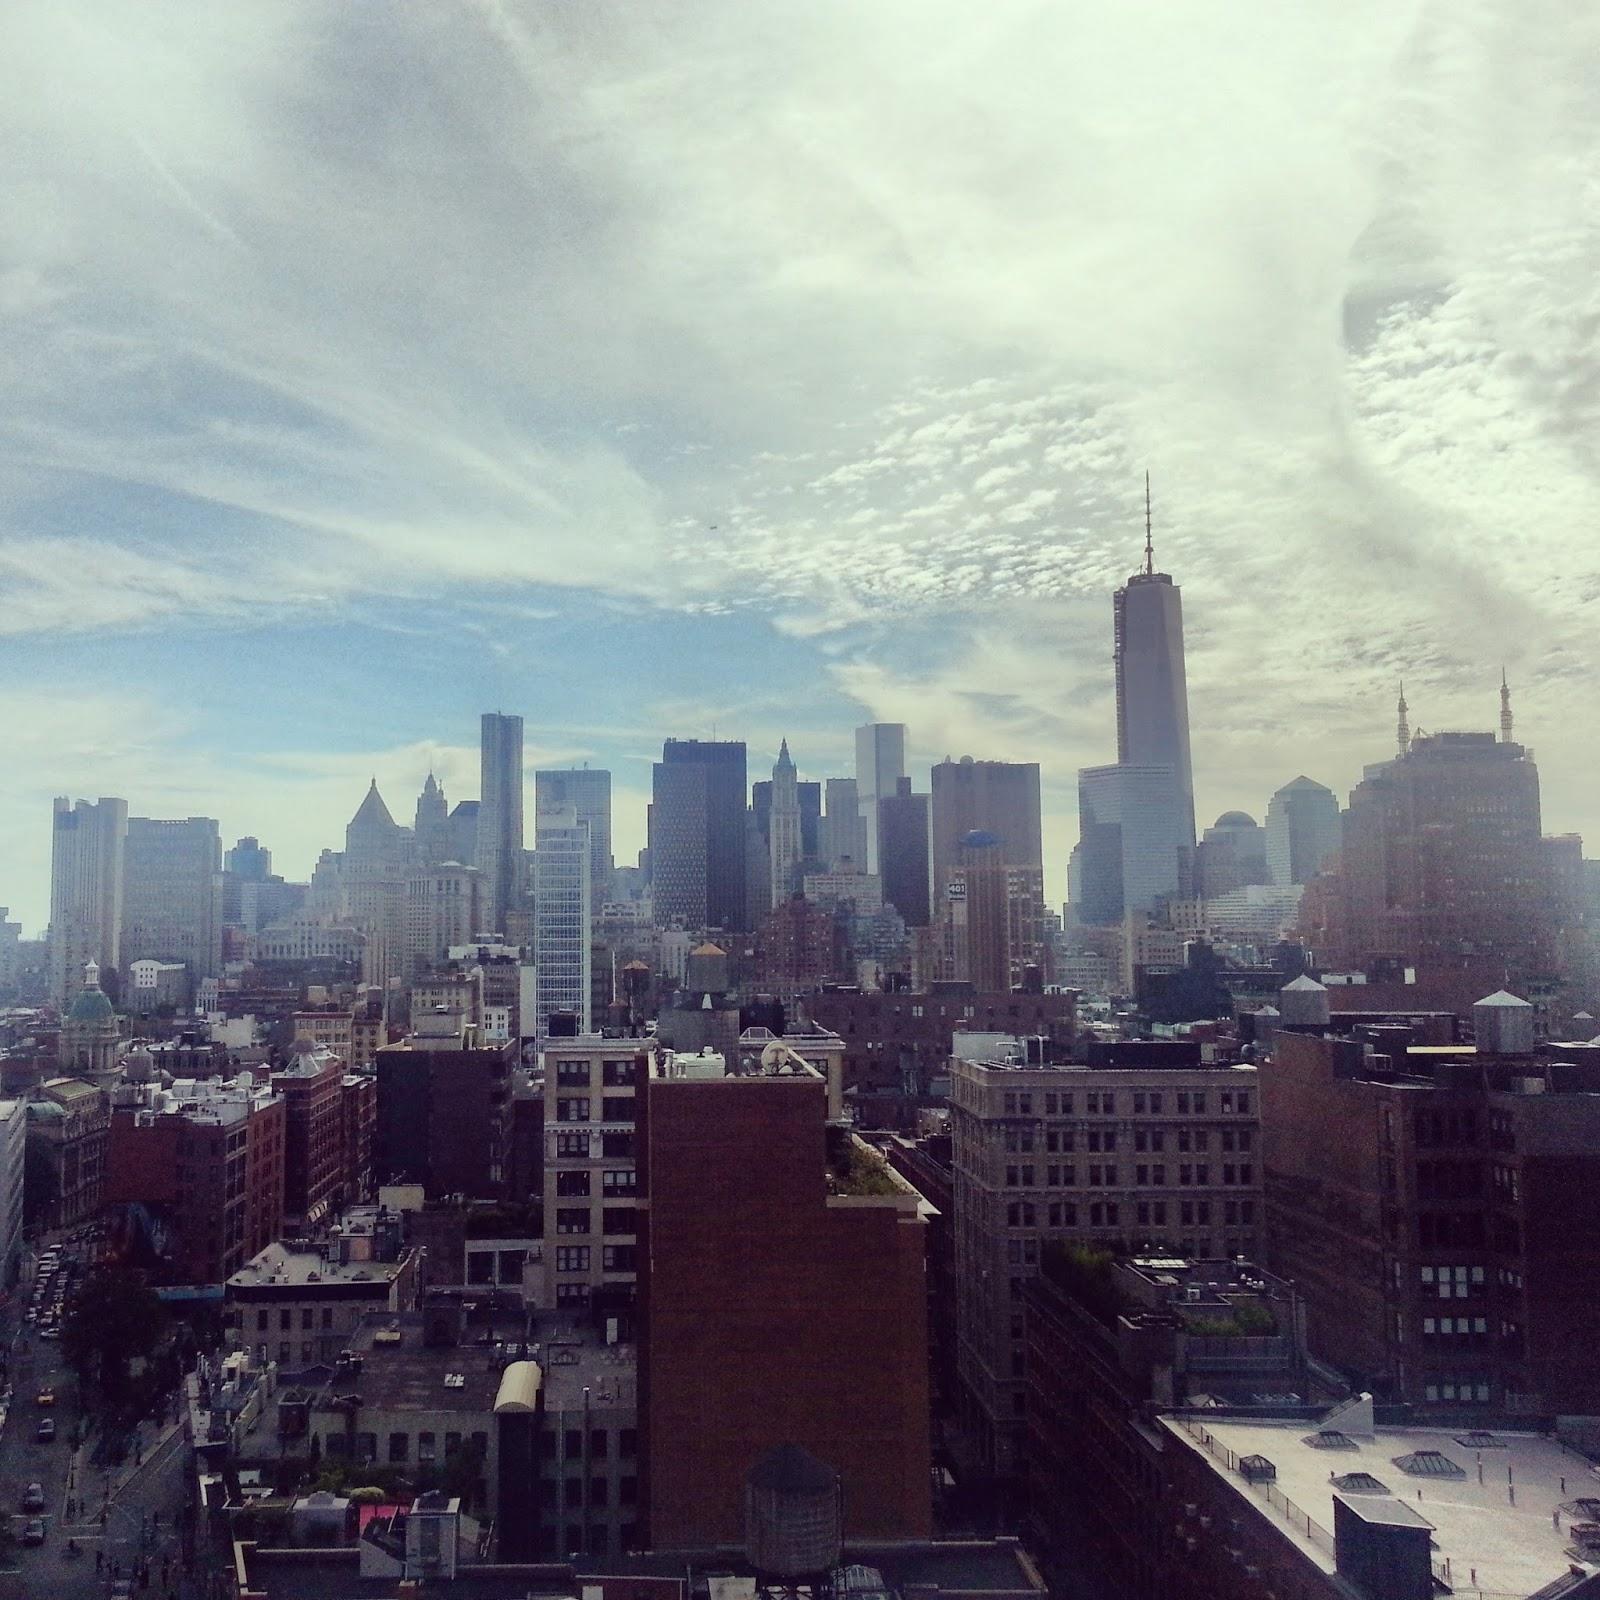 Soho - Downton NYC Skyline  |  One year later on *sparklingly  |  http://sparklingly.blogspot.com